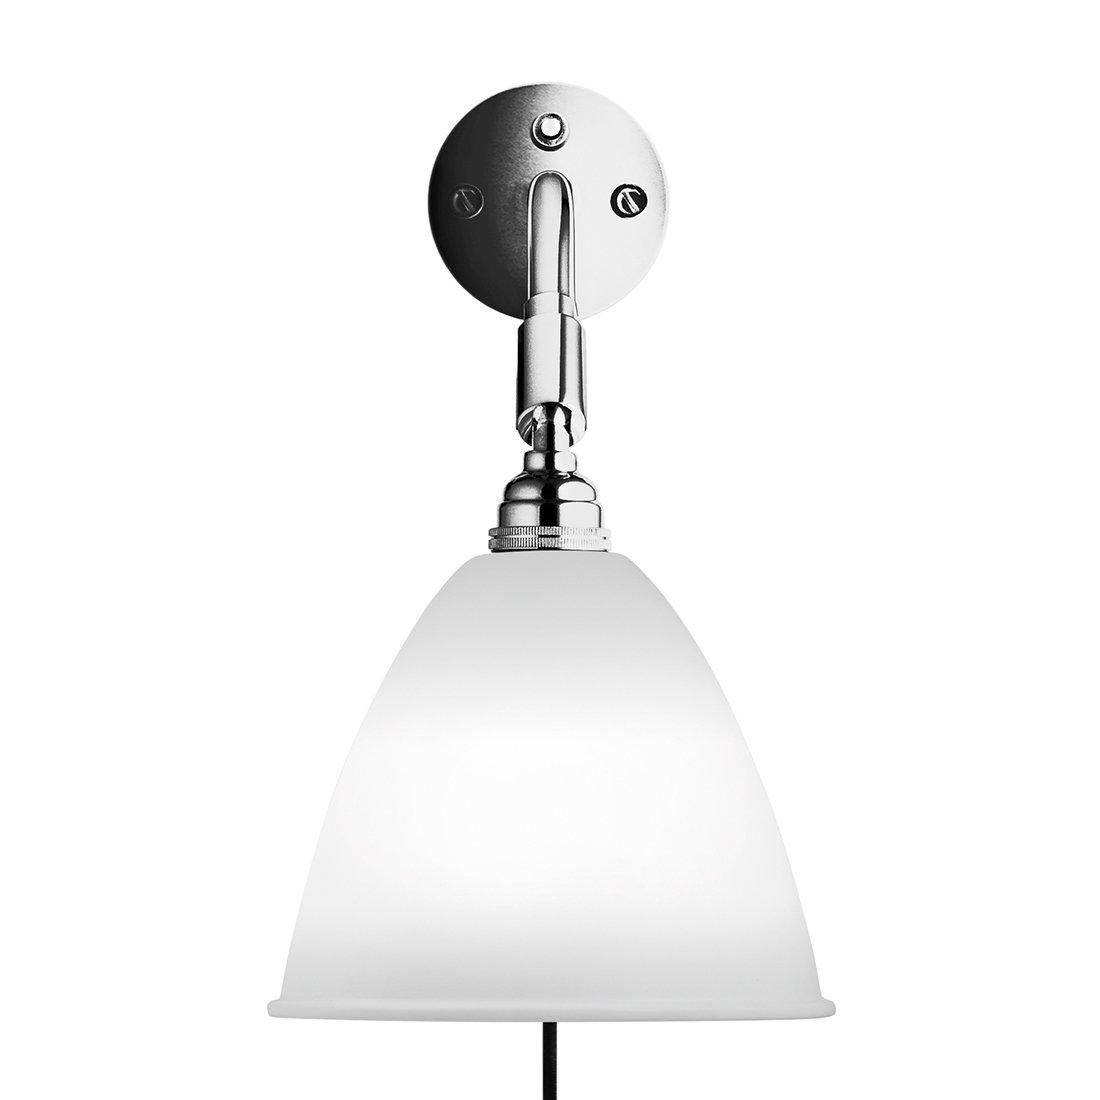 Gubi Bestlite BL7 Wandlamp Met Stekker Porselein Chroom